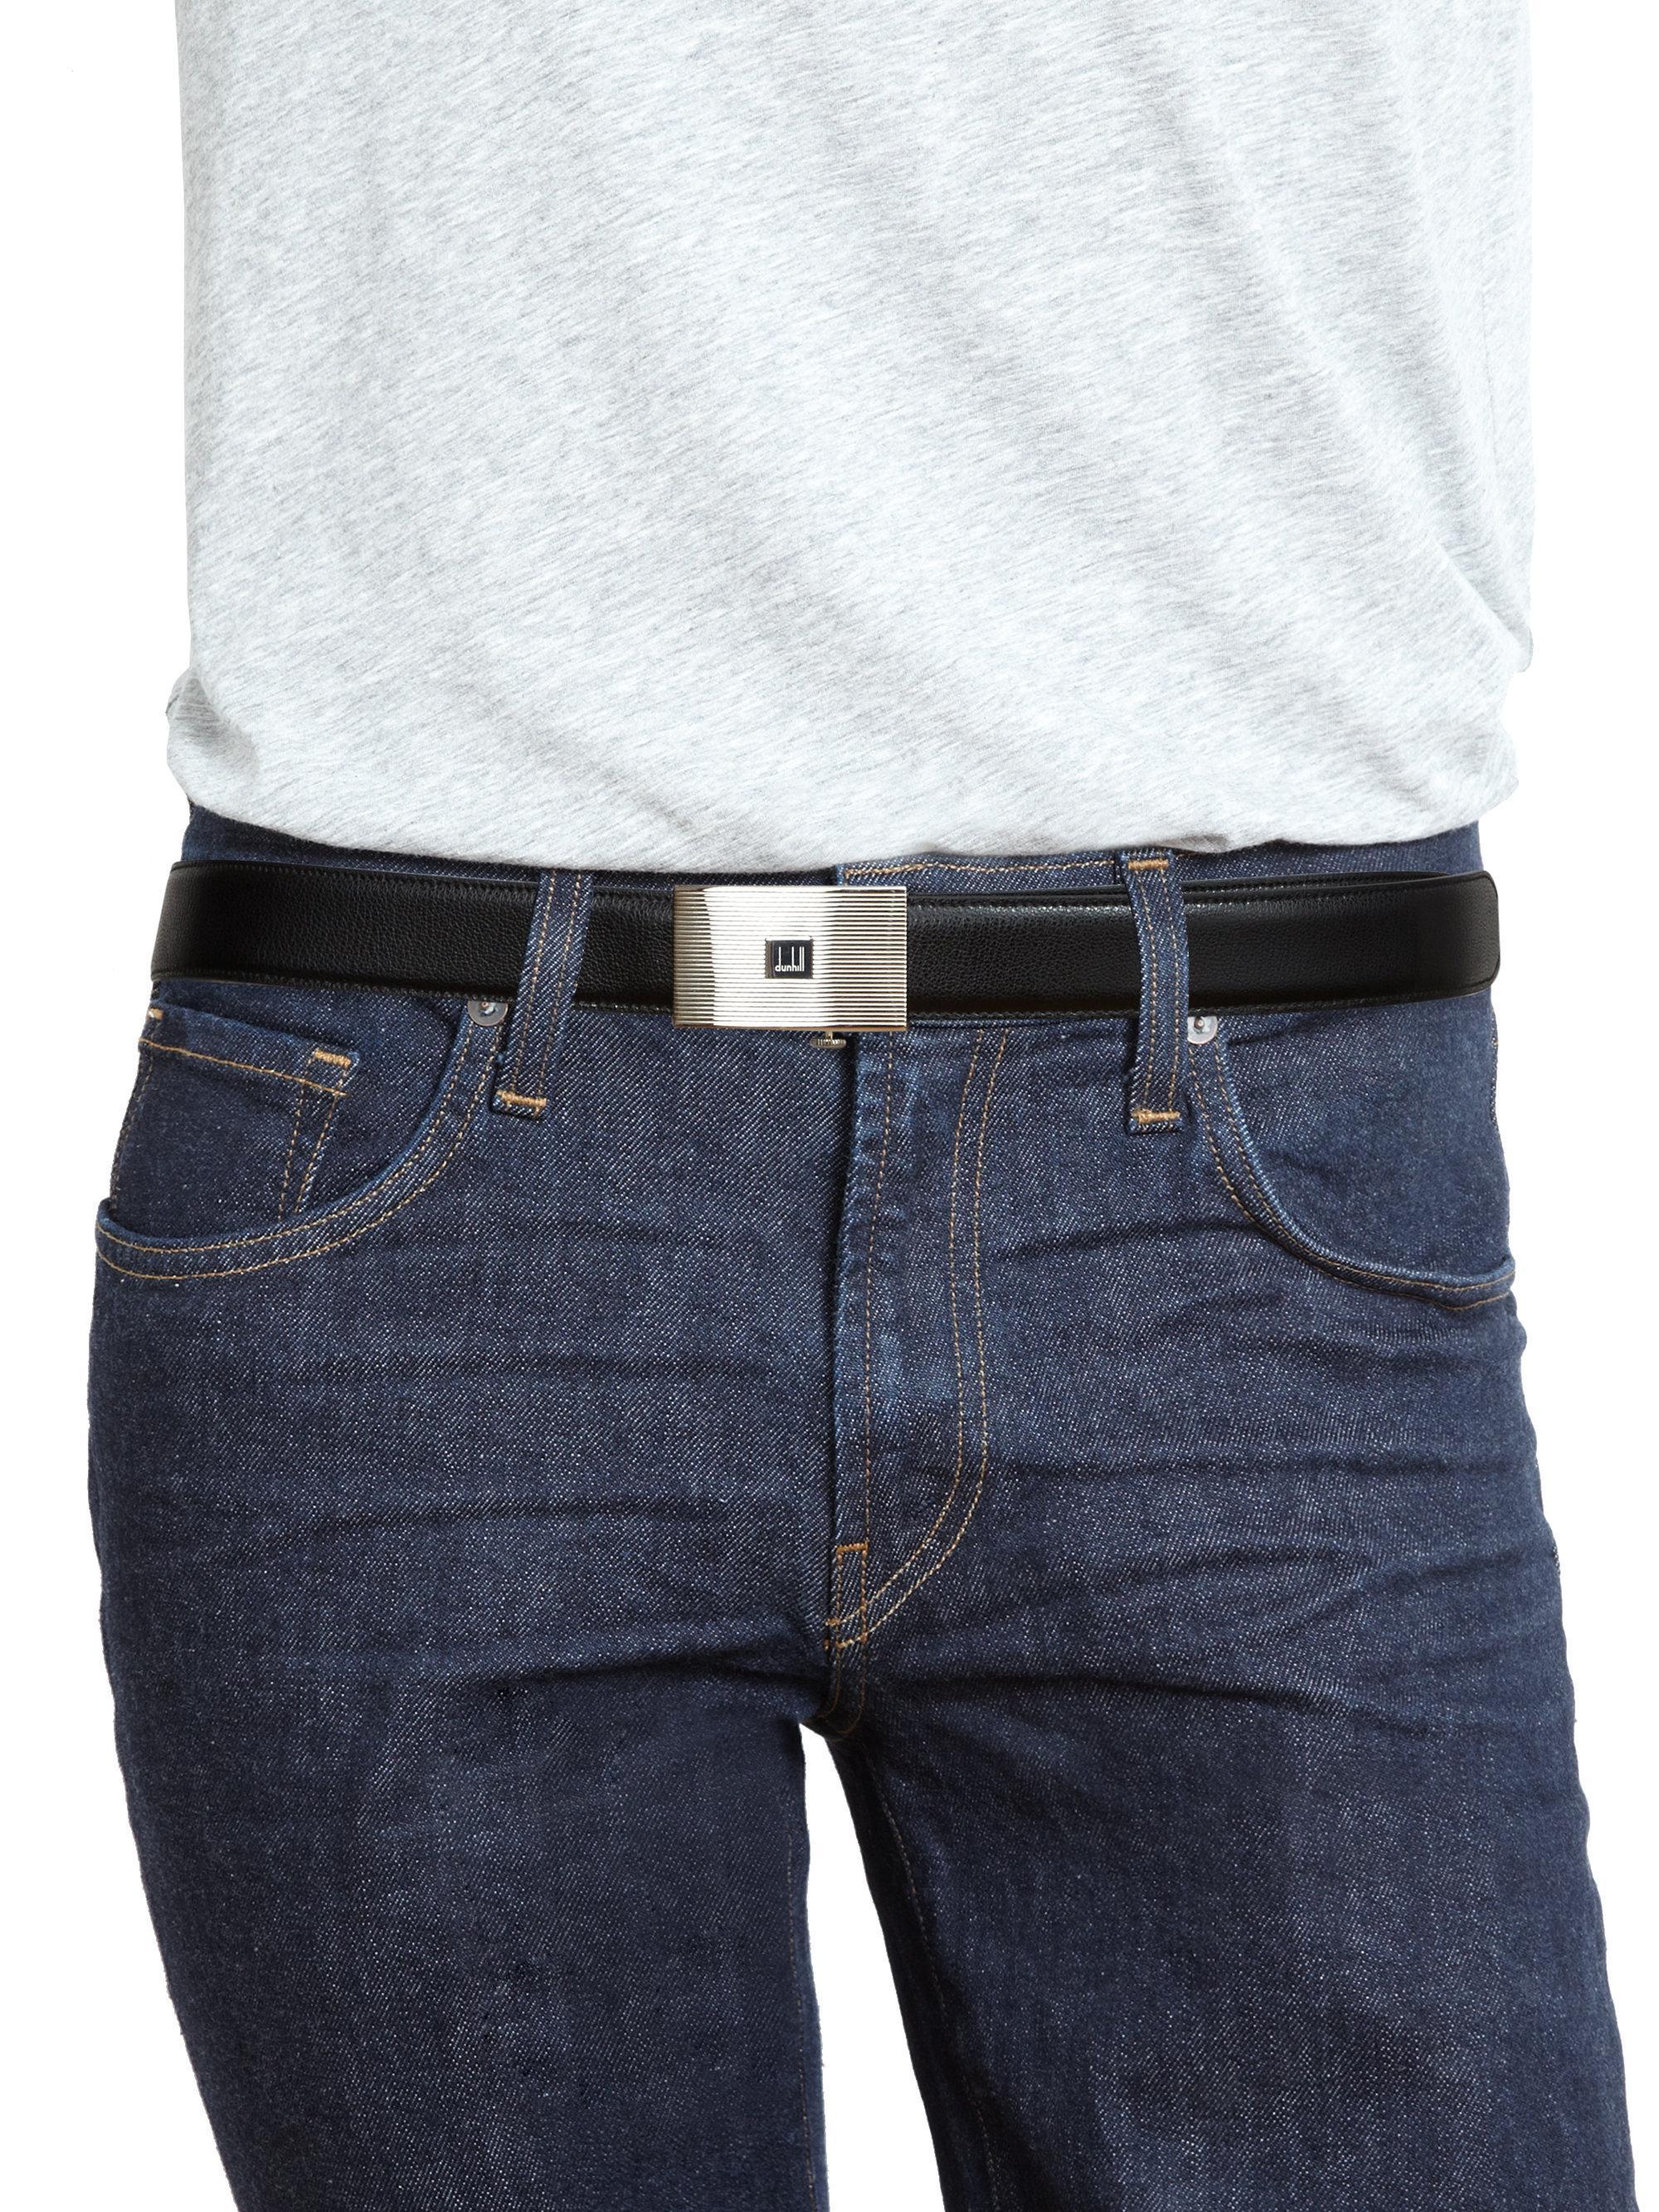 Dunhill Cowhide Leather Logo Belt In Black For Men Lyst